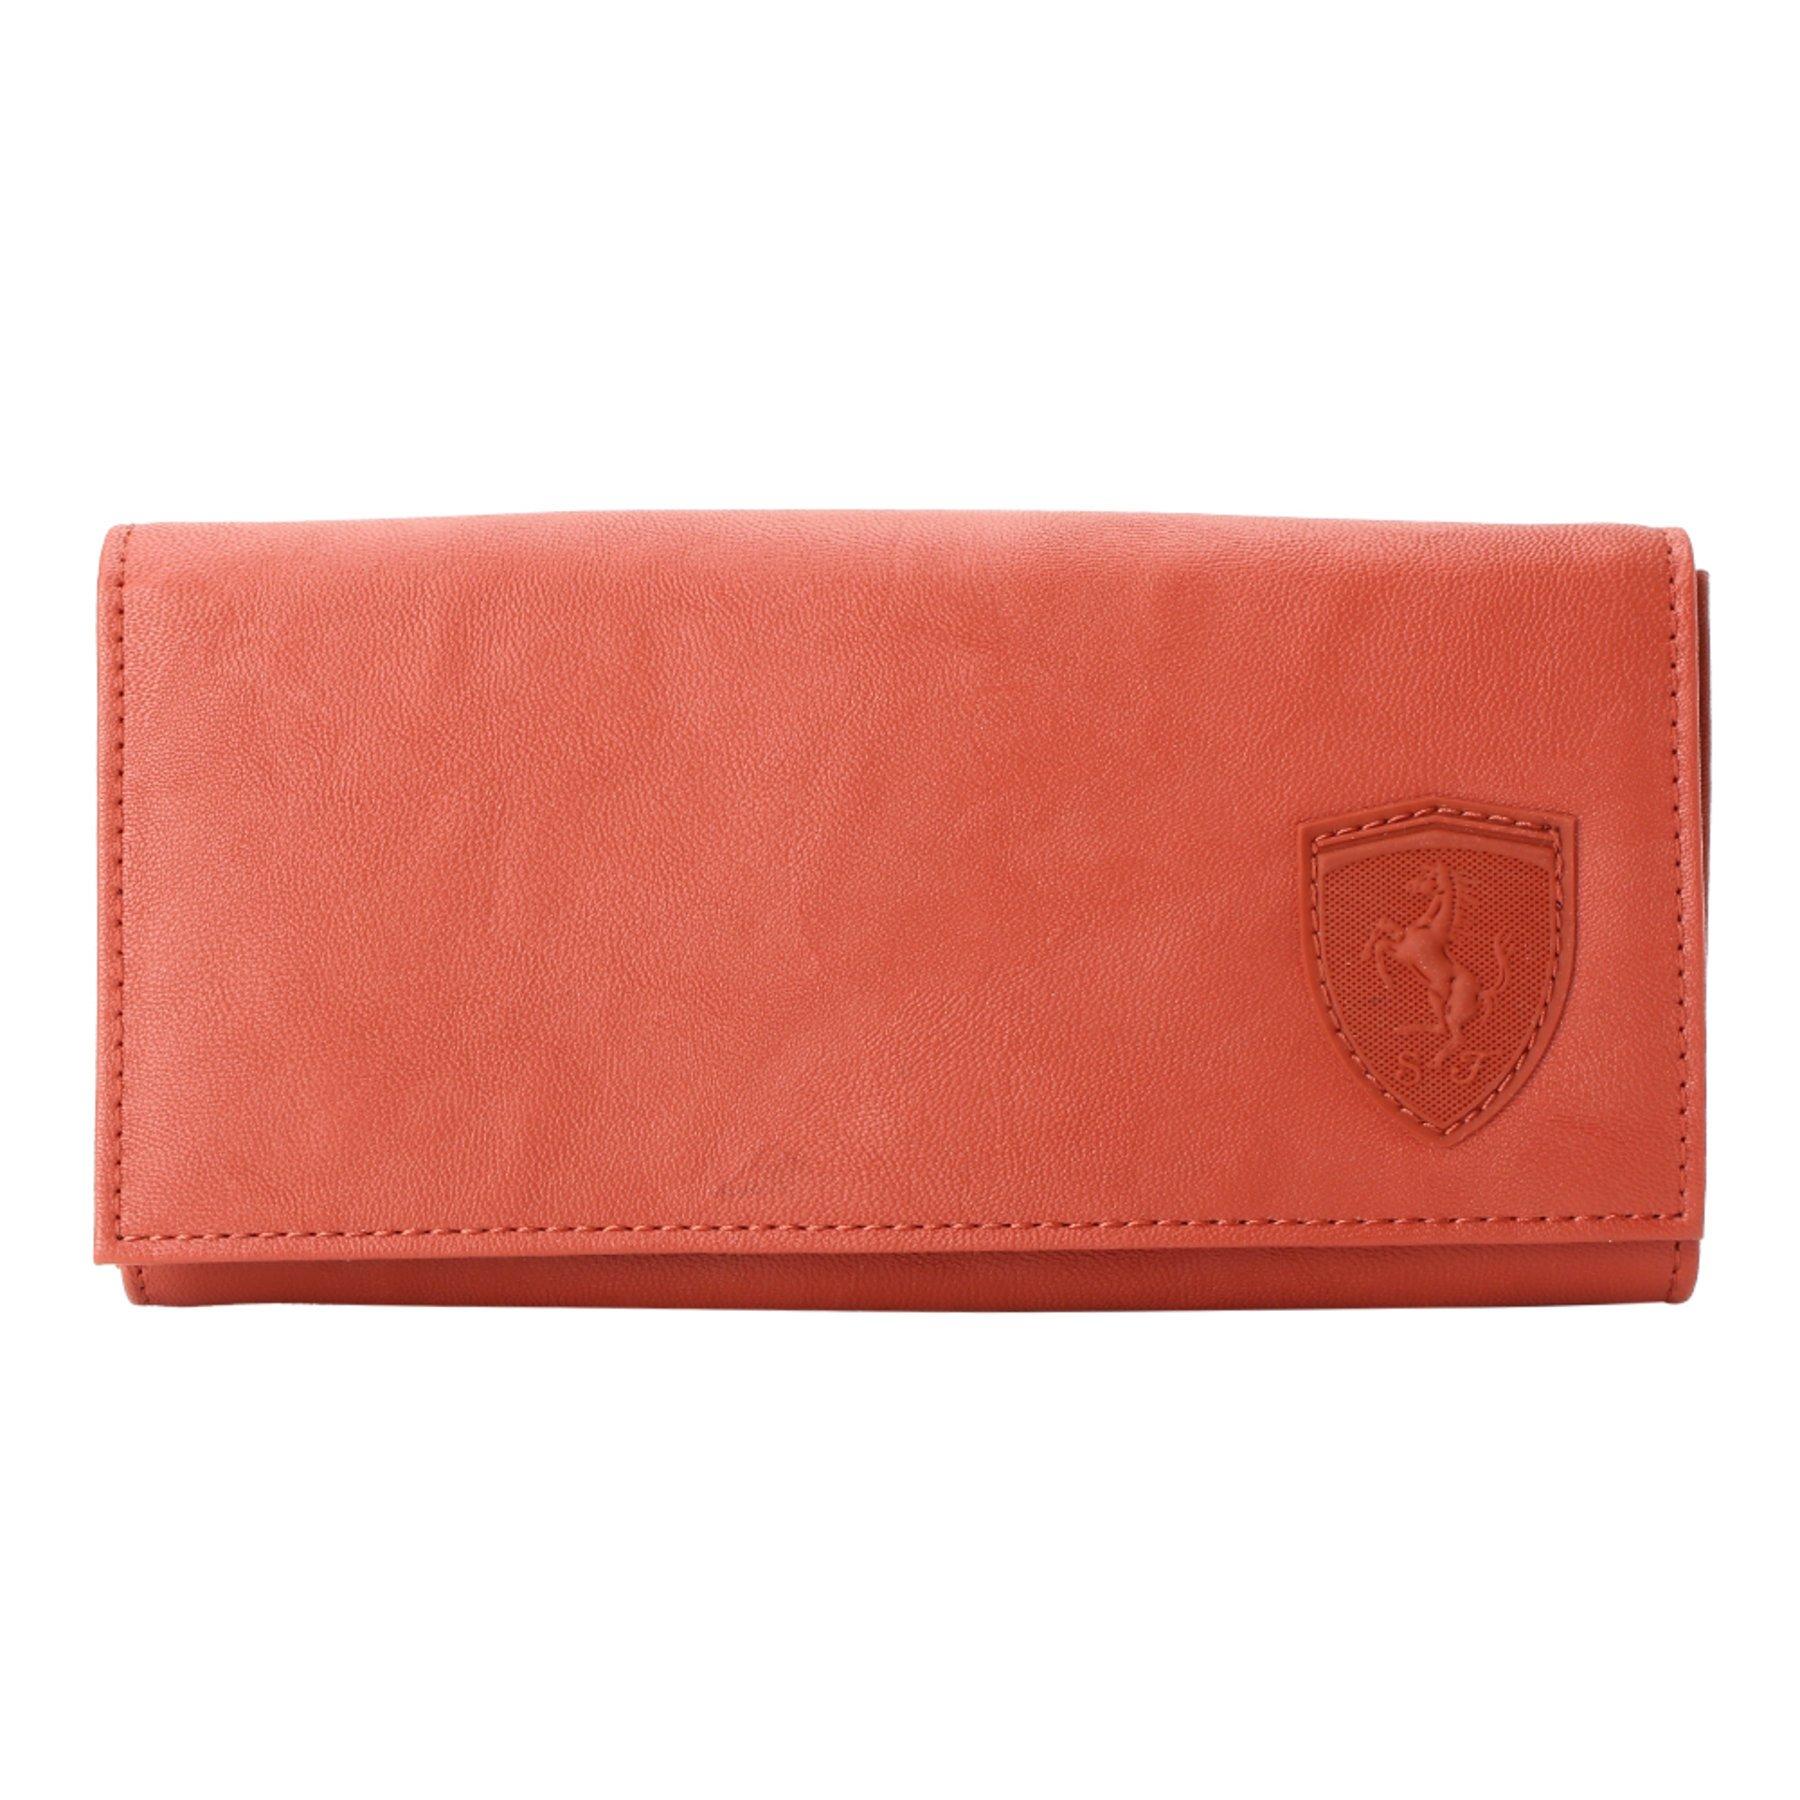 9421c5ec7e1c Get Quotations · PUMA Ferrari Red Ladies Wallet